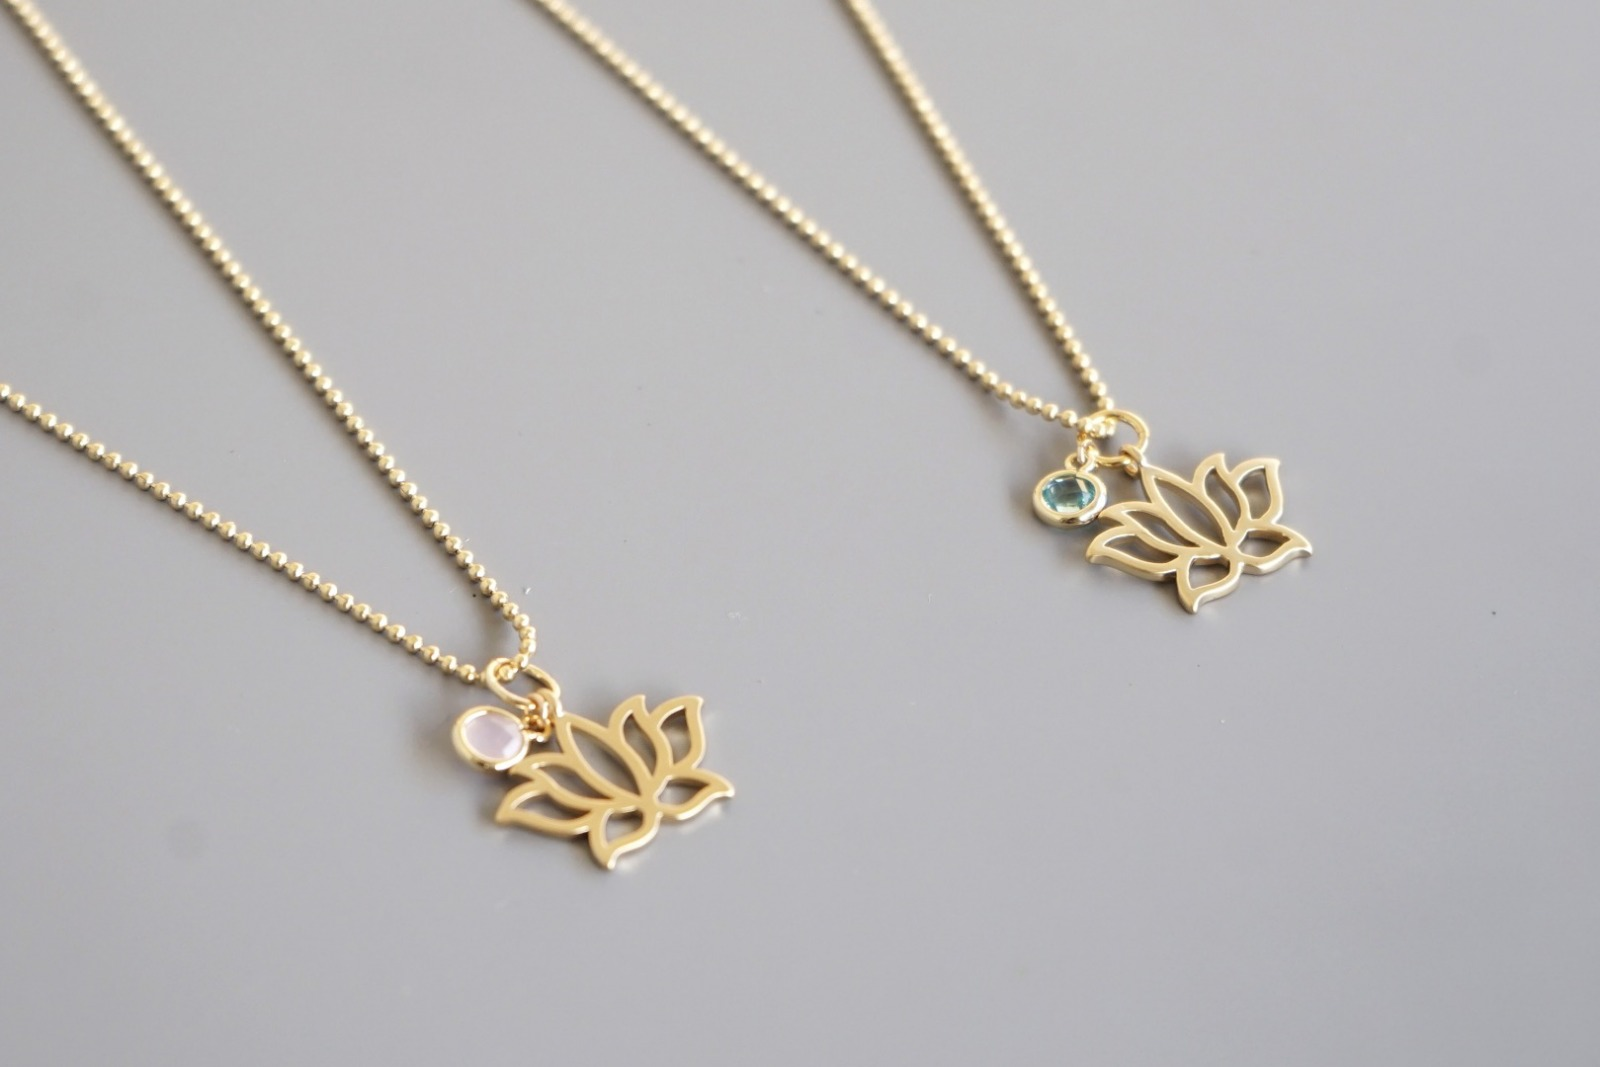 Kugelkette mit Lotusblüte und Kristall - rosa - 3